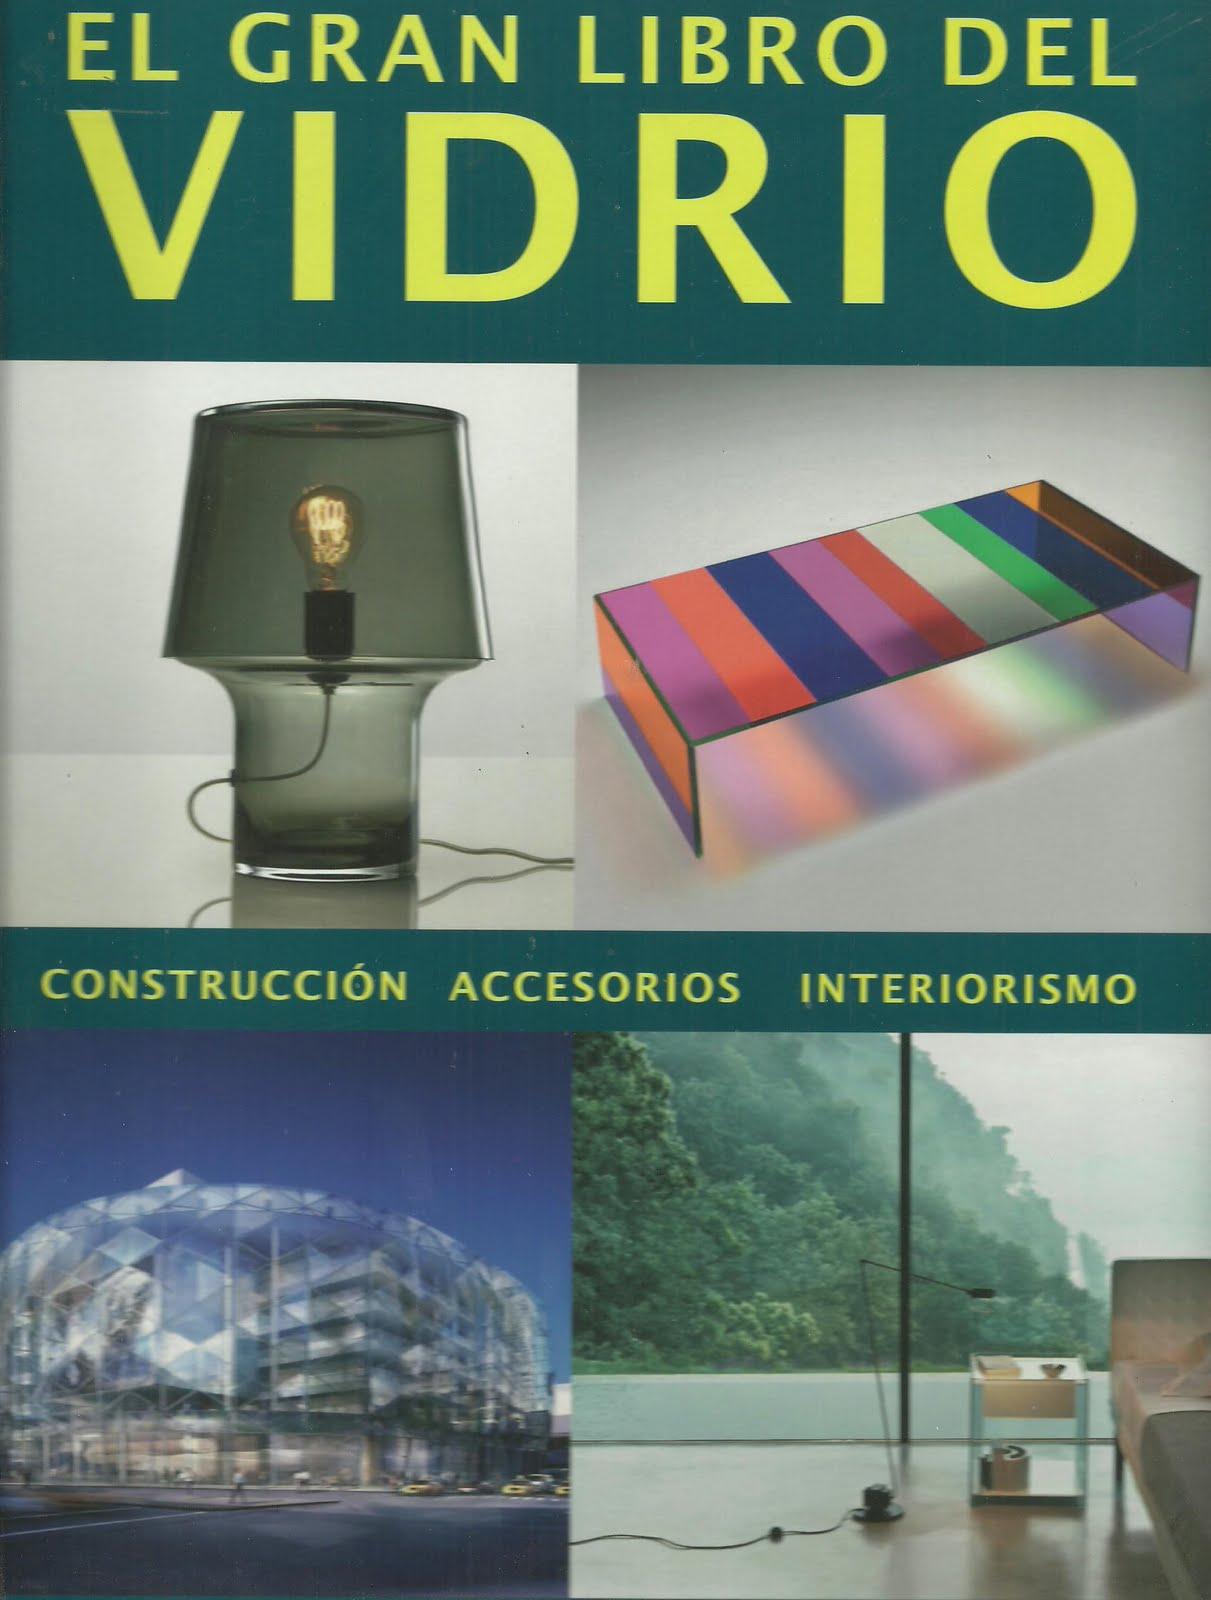 Libros dvds cd roms enciclopedias educaci n preescolar - Libros interiorismo ...